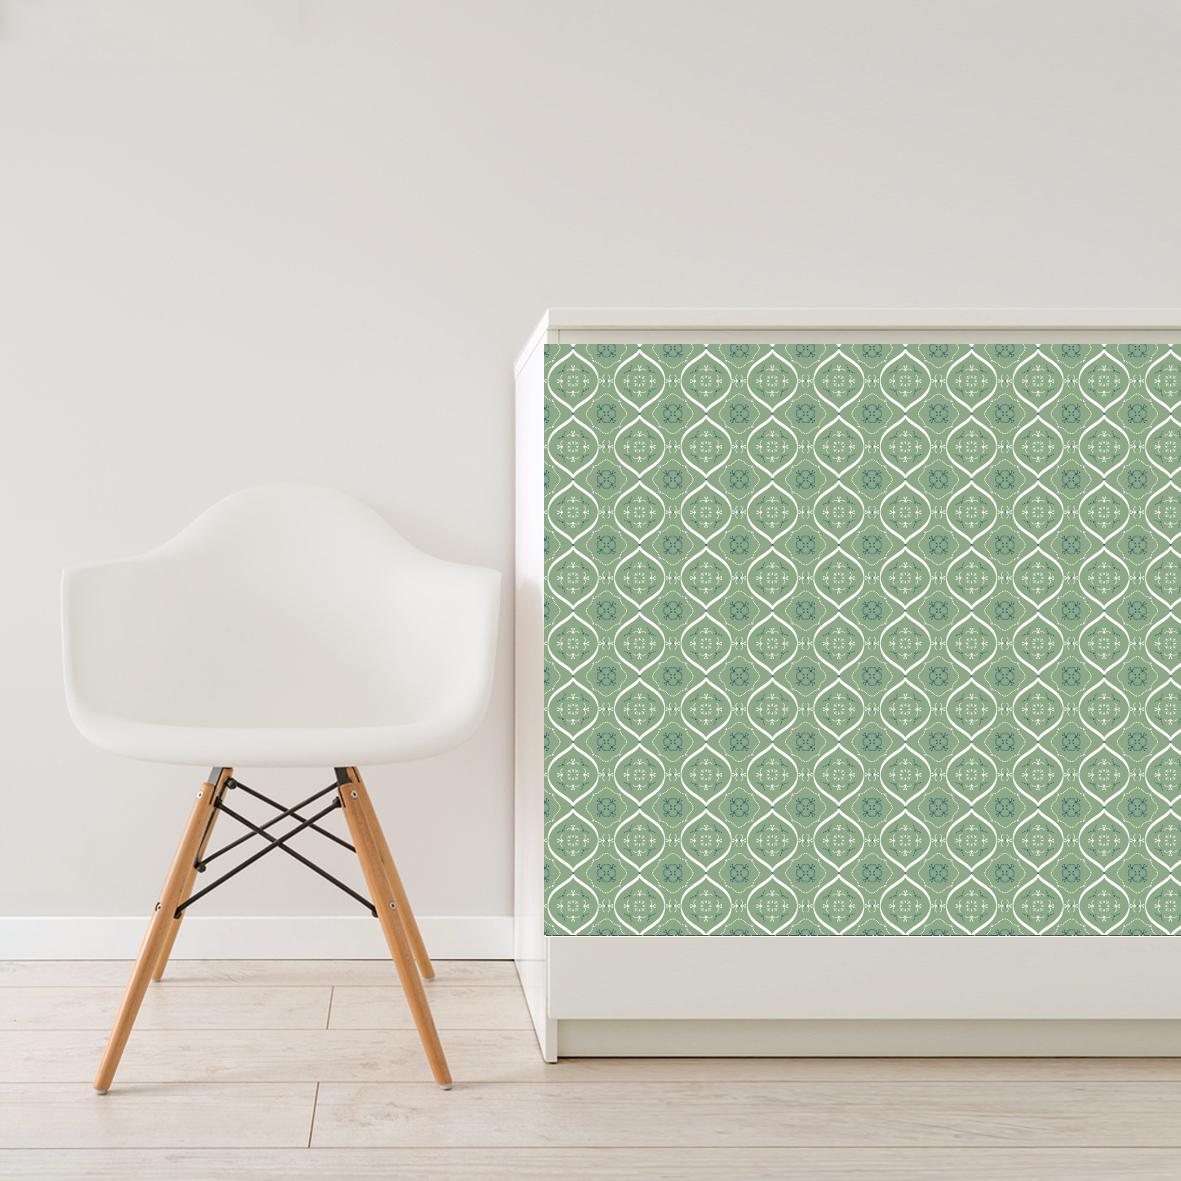 delhi gruen selbstklebefolie wand akzente. Black Bedroom Furniture Sets. Home Design Ideas